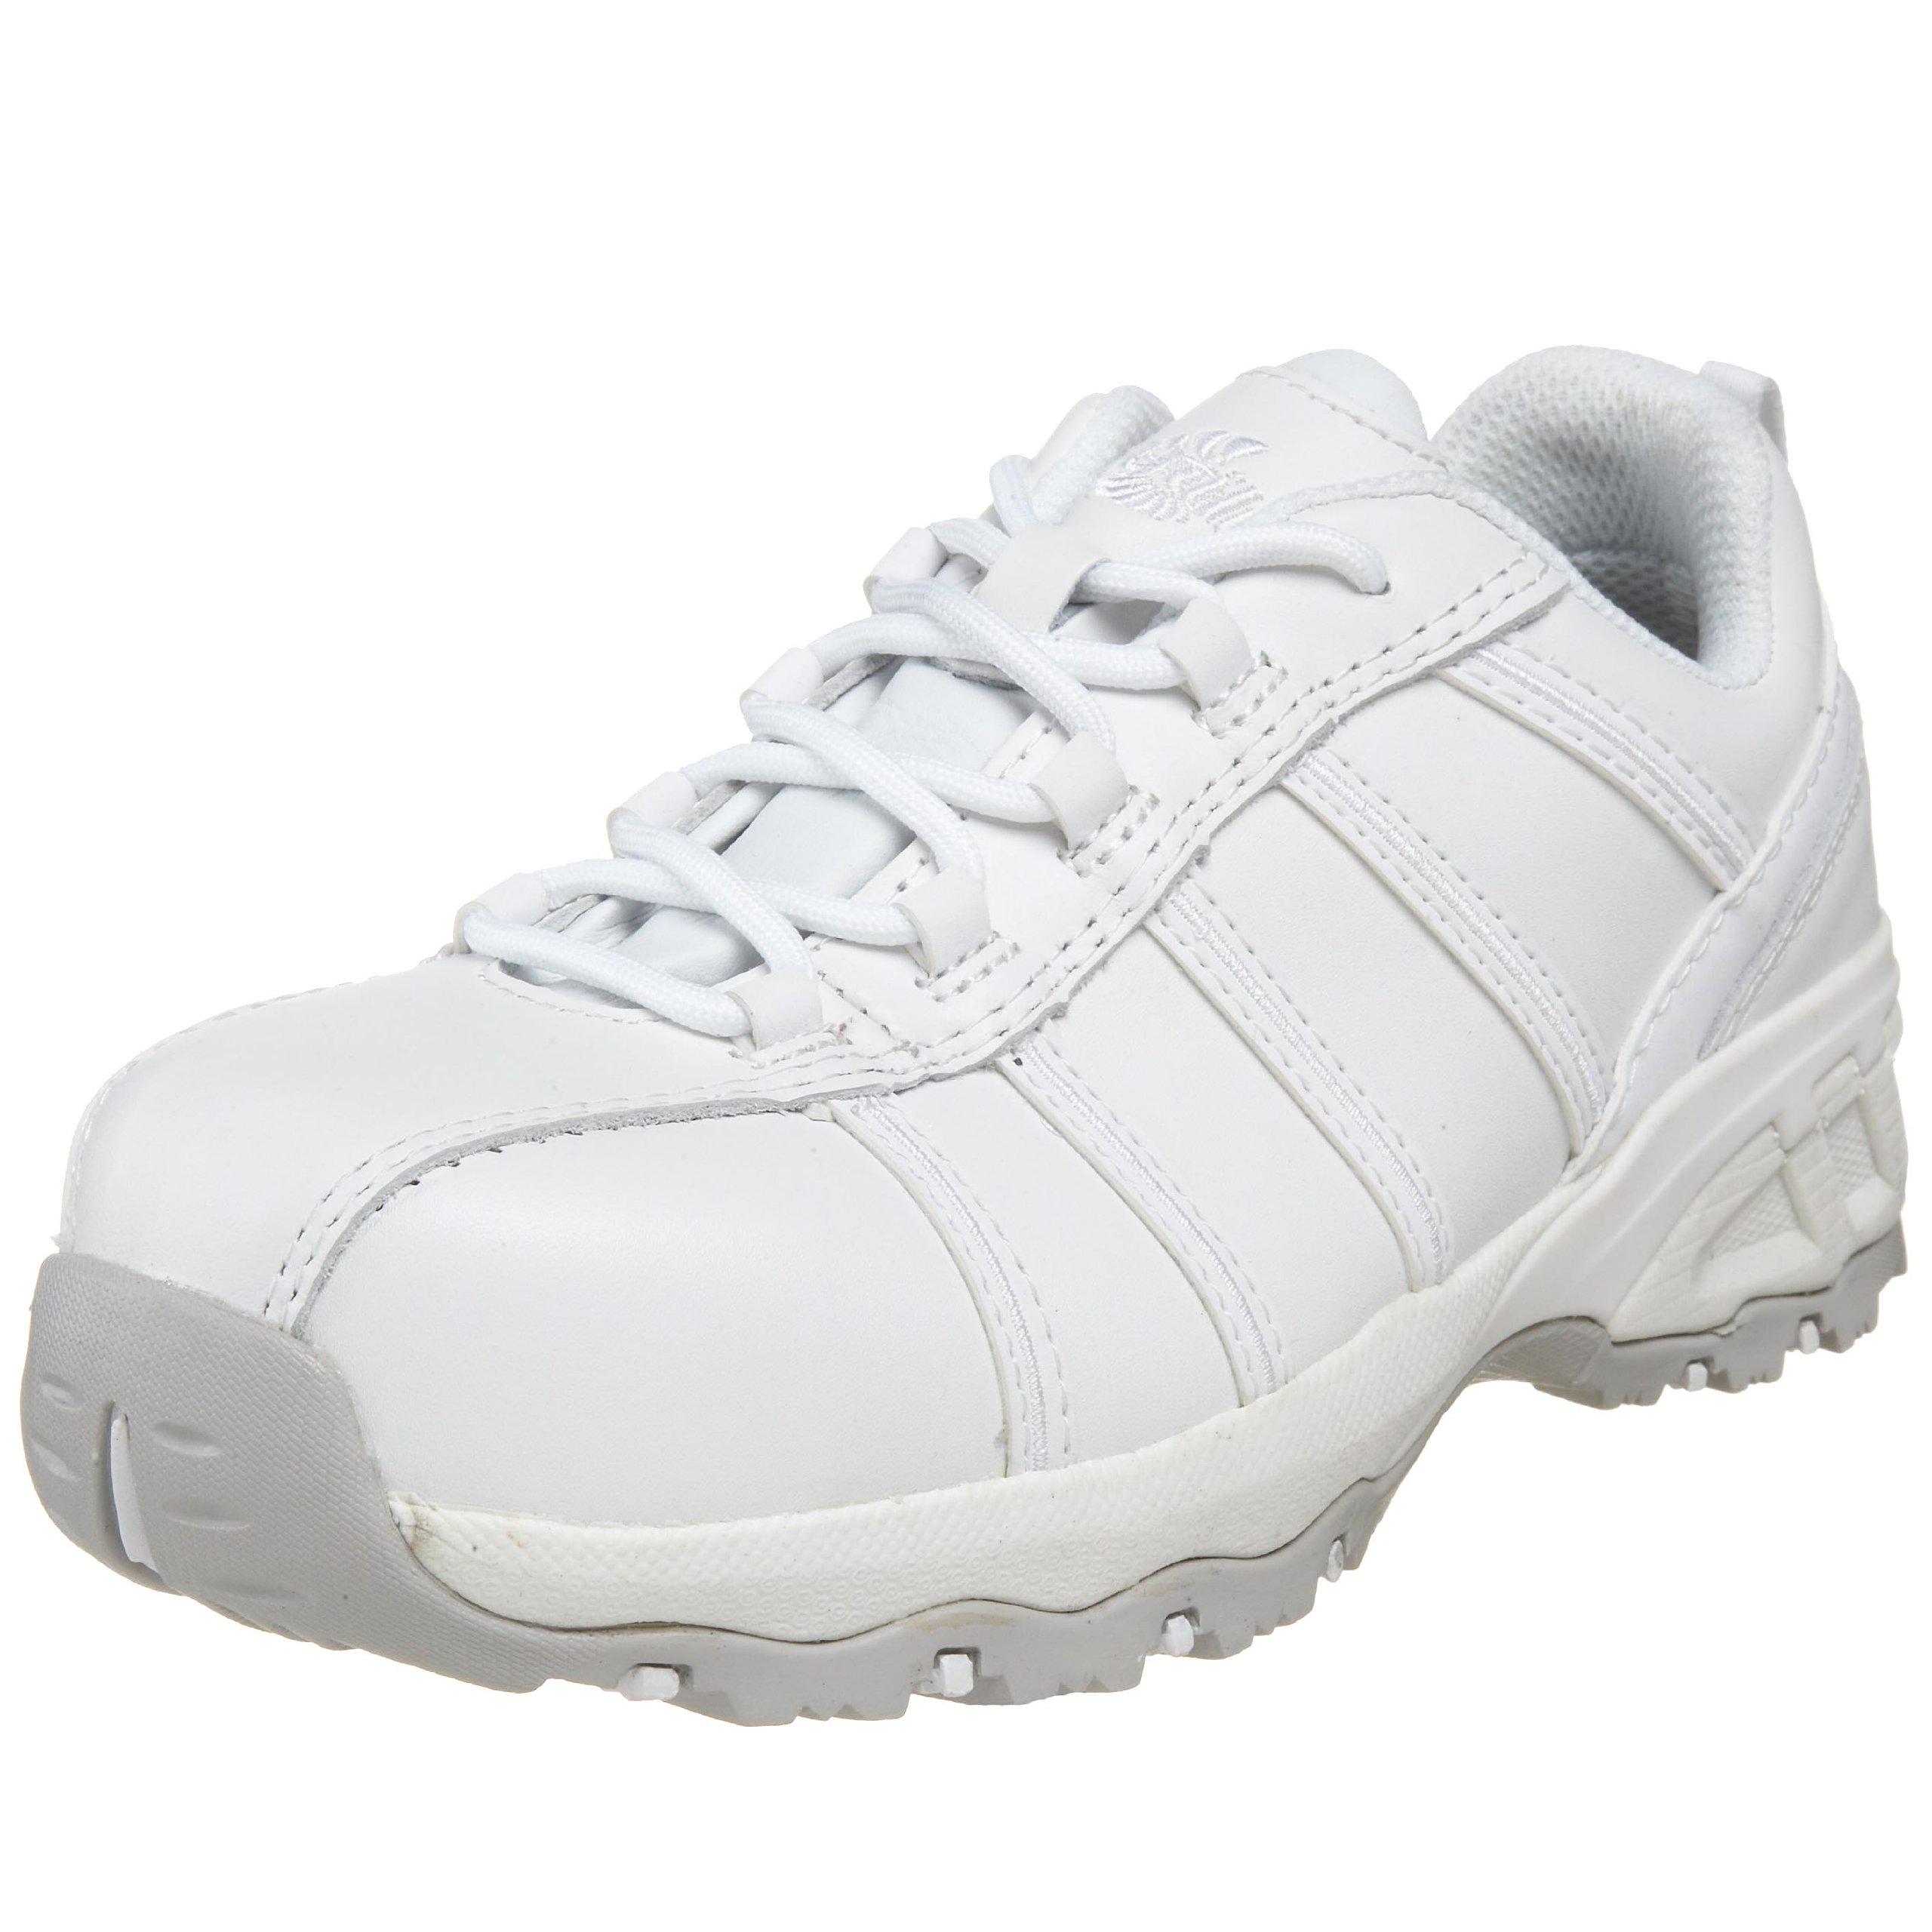 Nautilus 1756 Women's Comp Toe No Exposed Metal EH Athletic Shoe ,White,8.5 W US